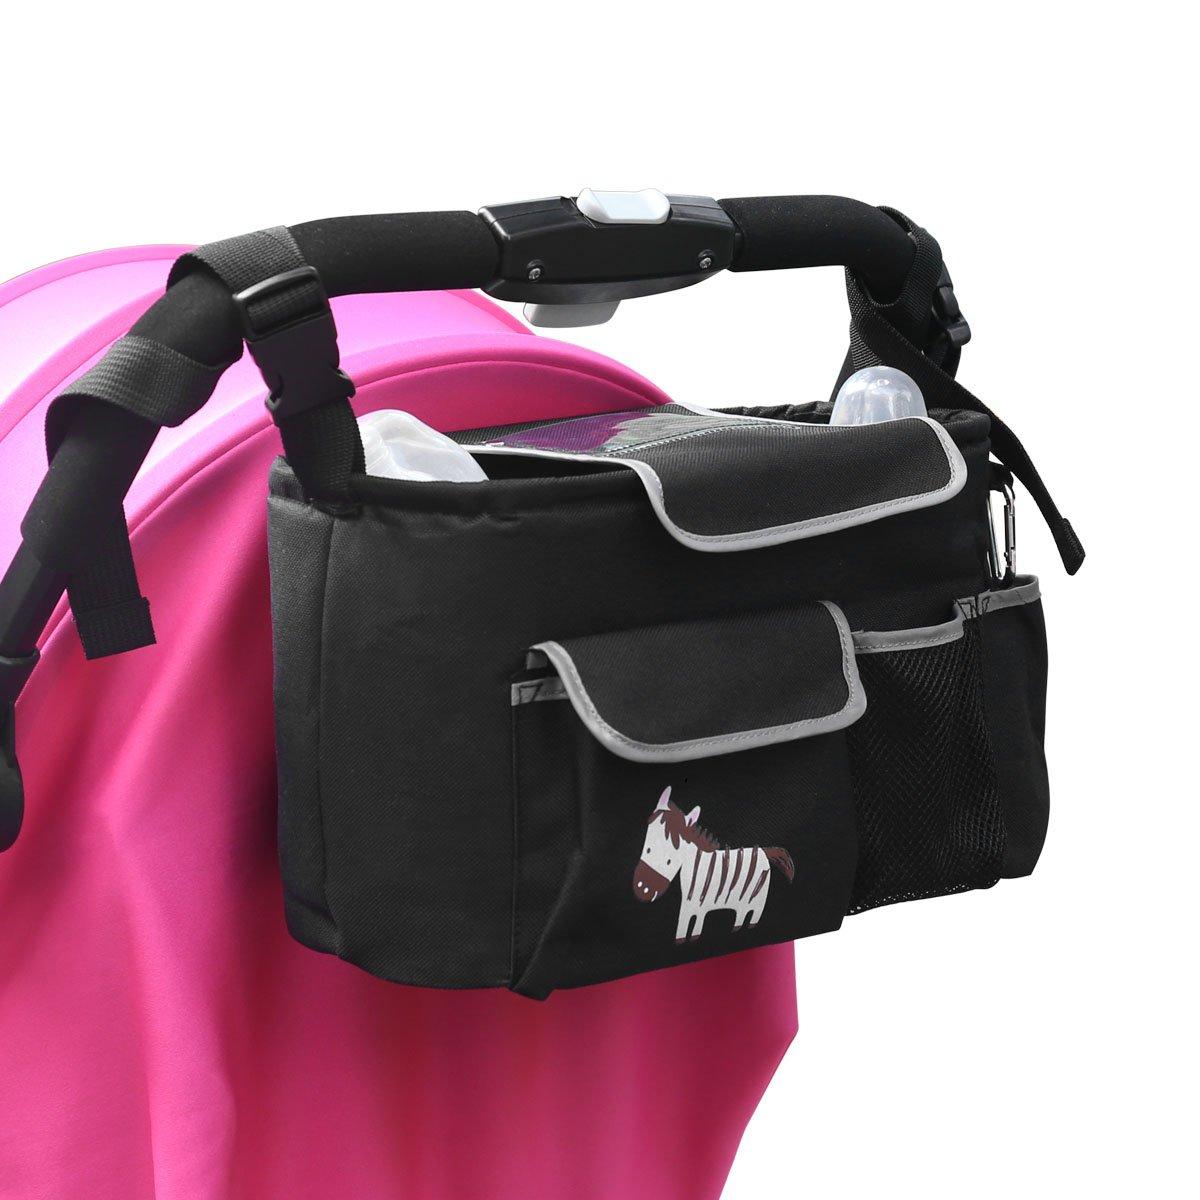 Baby Buggy Organiser Pram Buggy Buddy Stroller Organiser Storage Bag Universal for Traveling or Outings with Bottle Holders